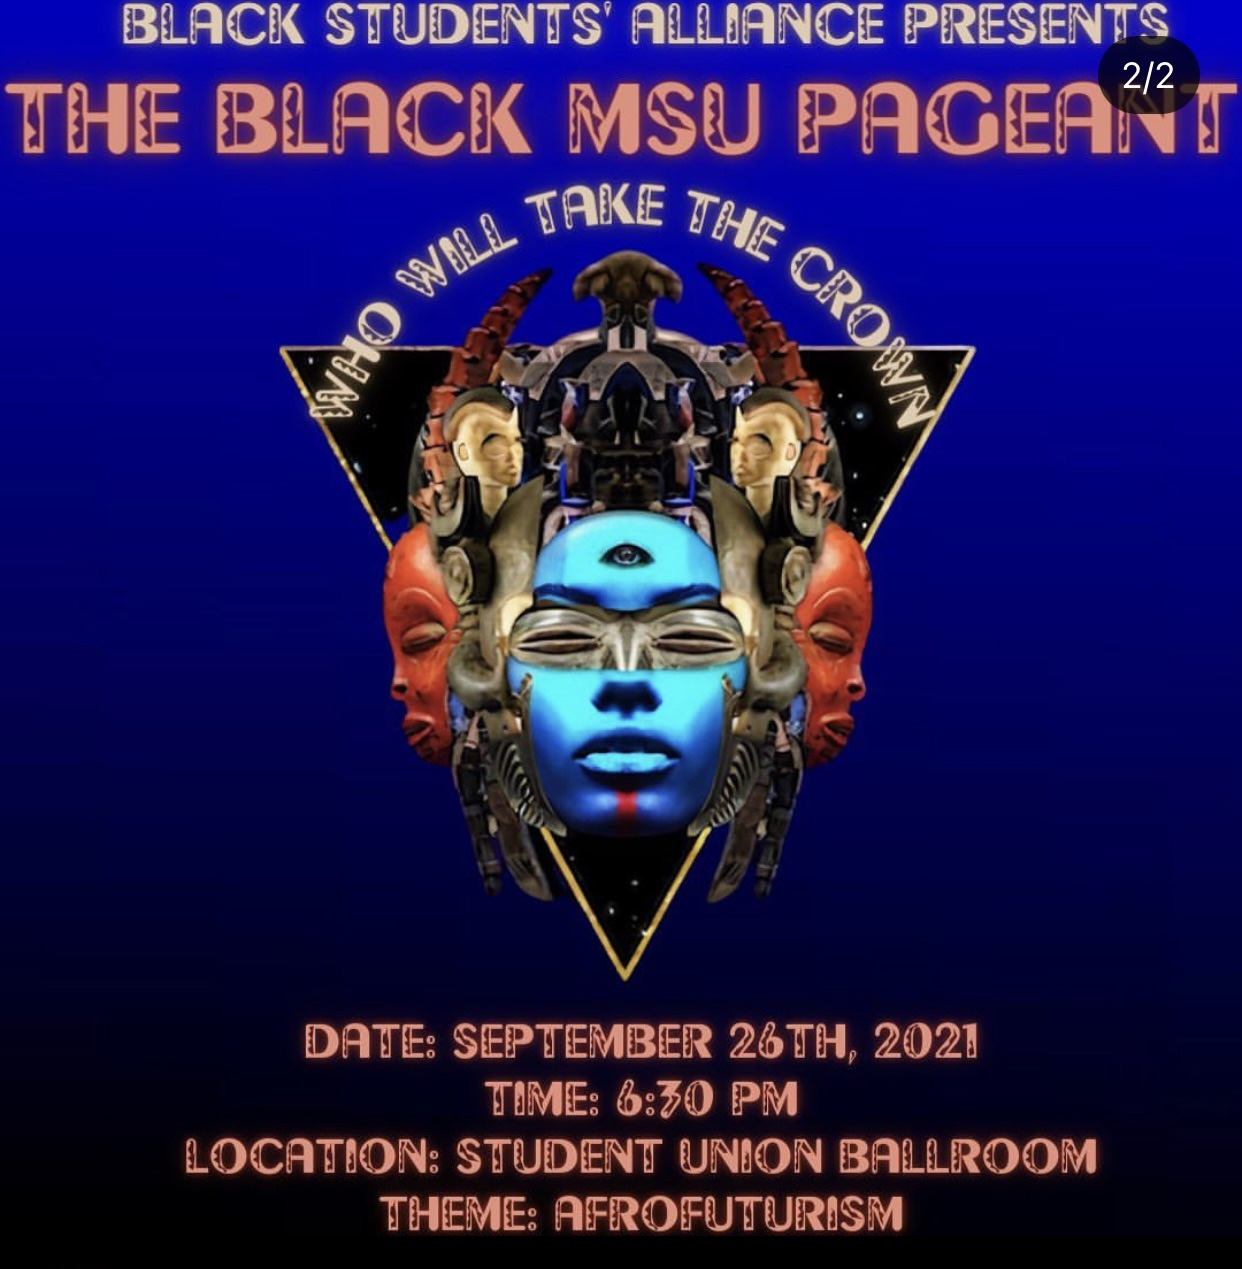 The Black MSU Pageant @ Student Union Ballroom